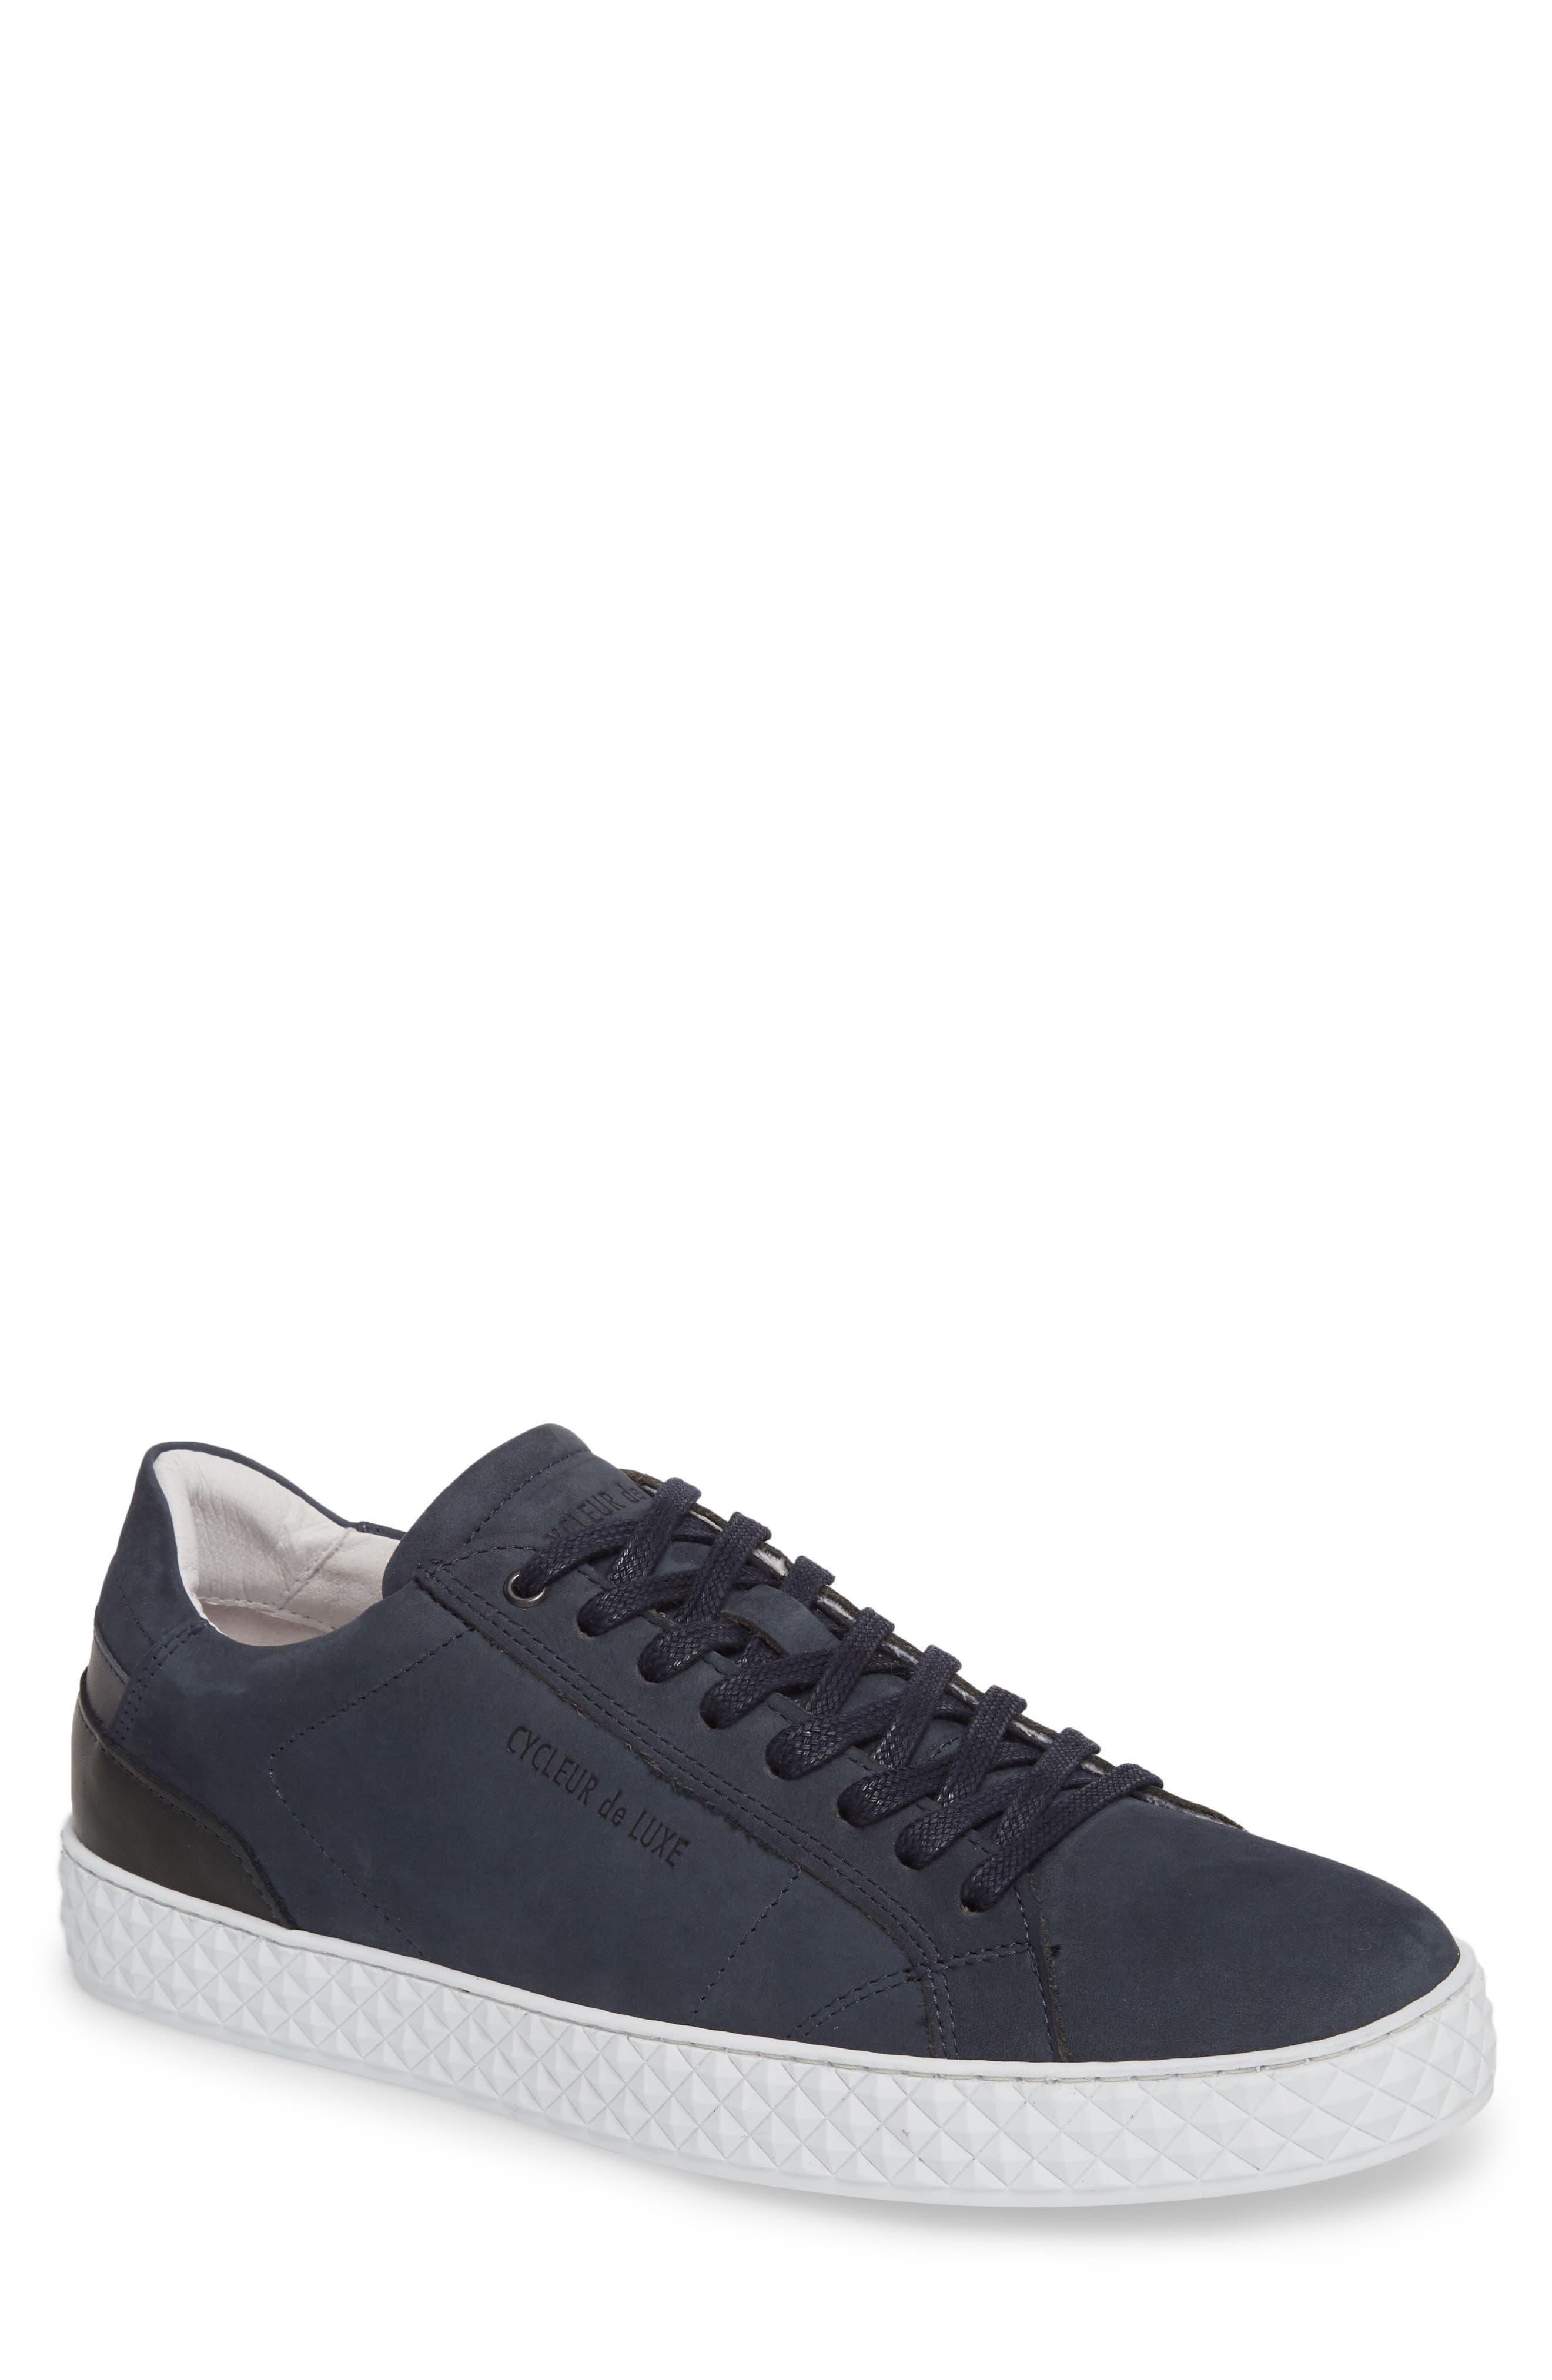 Bratislava Low Top Sneaker,                             Main thumbnail 1, color,                             Navy Leather